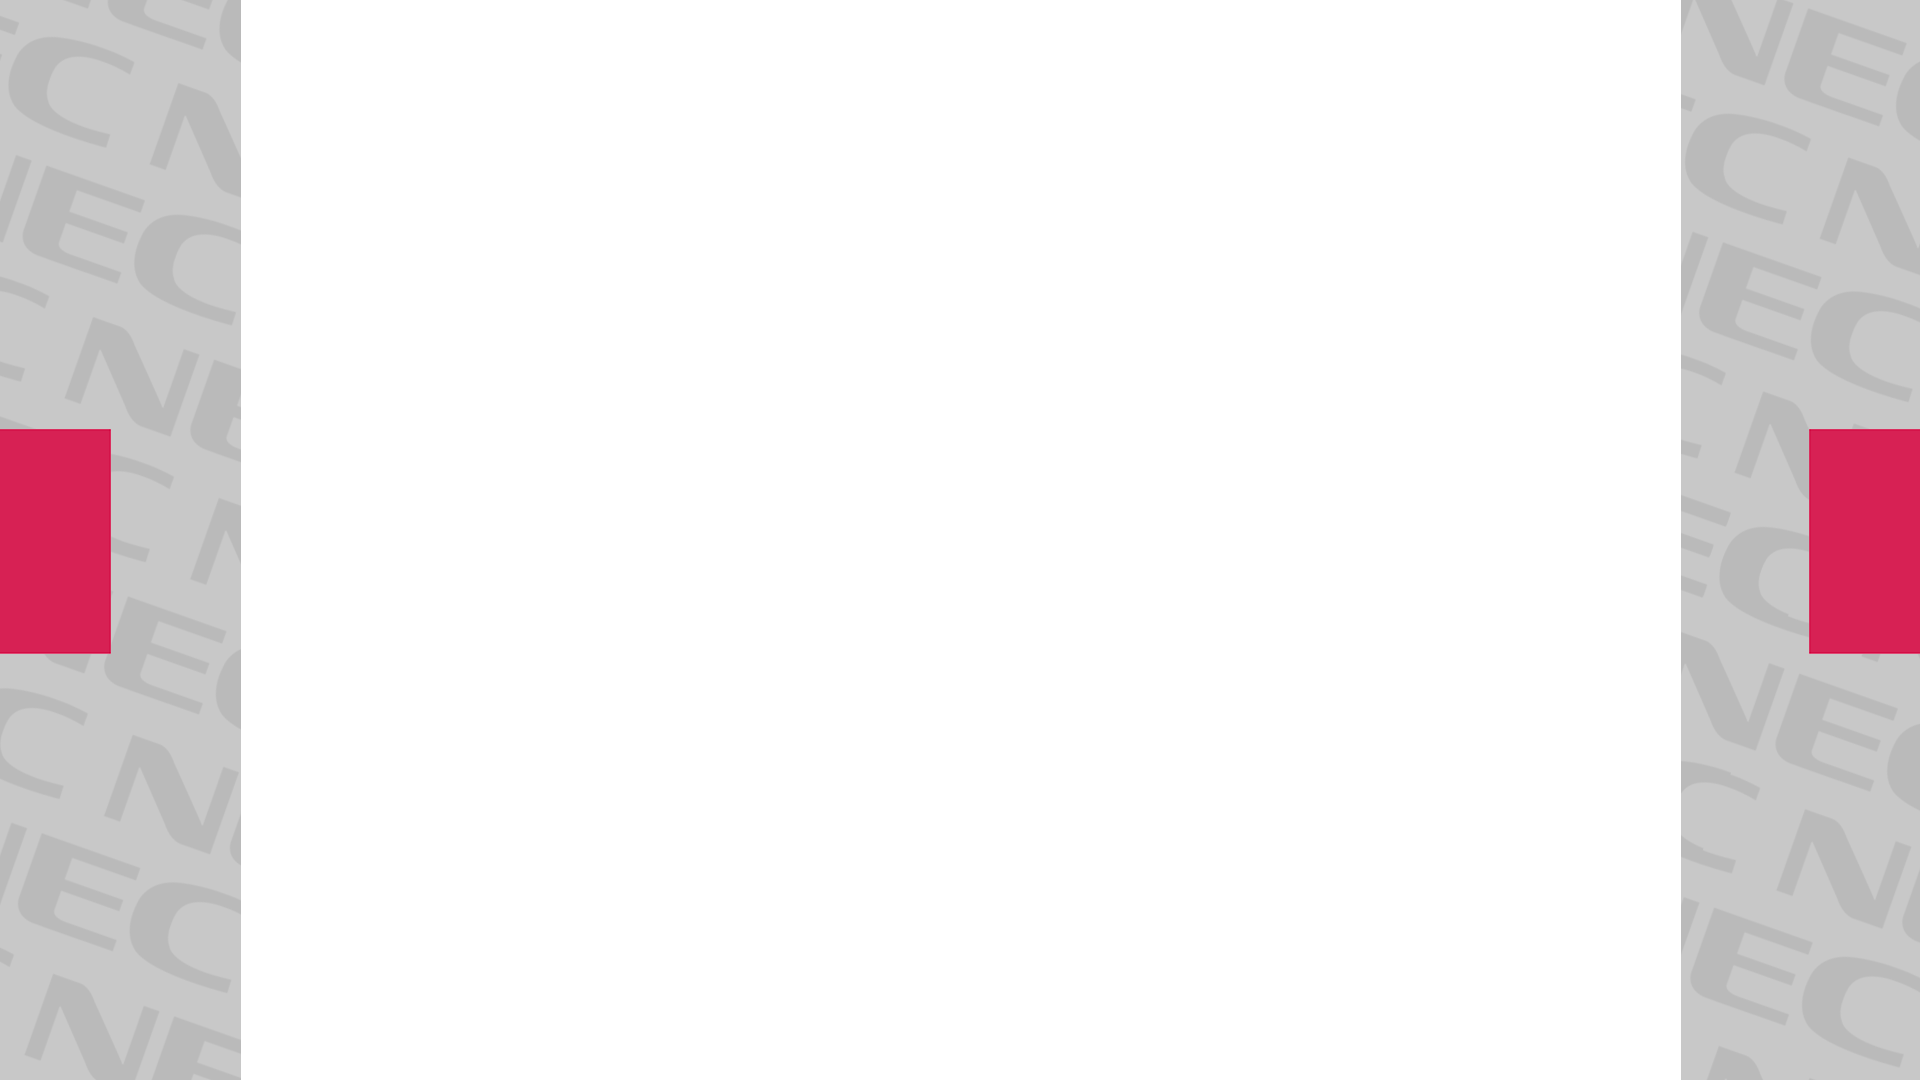 5aefd04edb4df_NECPC-FXcopia.png.1d9331ca131ef3b54998f622ea5018c3.png